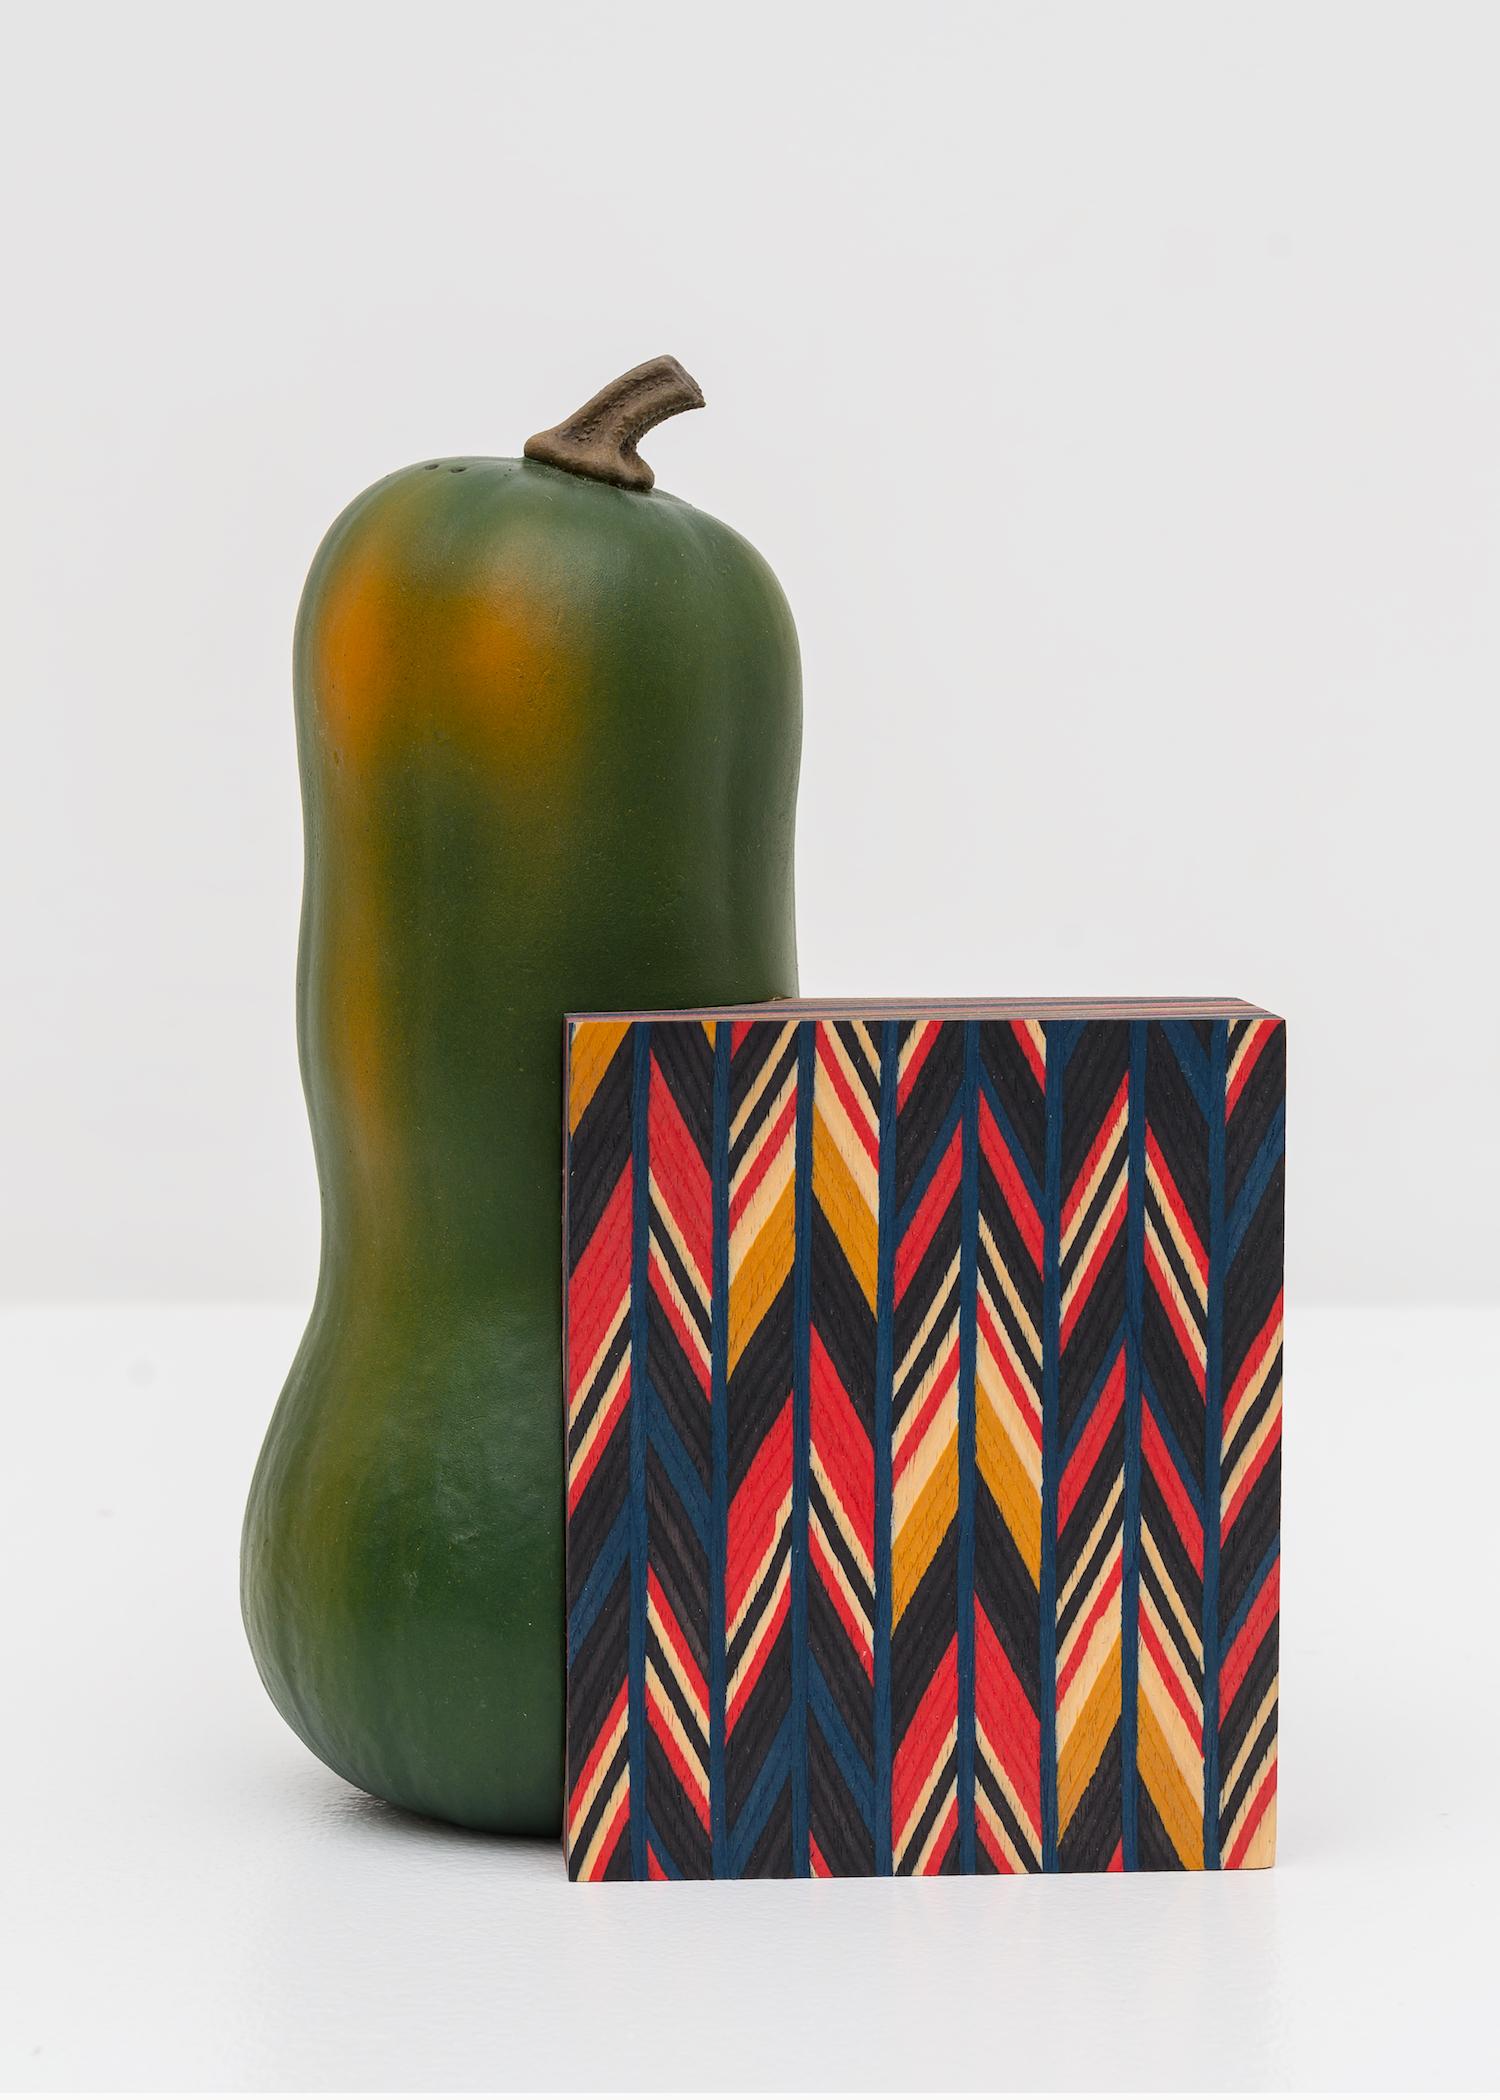 Frank Benson  Untitled (Aztec)  2011 Cast plastic, acrylic paint, wood, polyurethane, MDF 11h x 7 ½w x 4 ½d in FB001